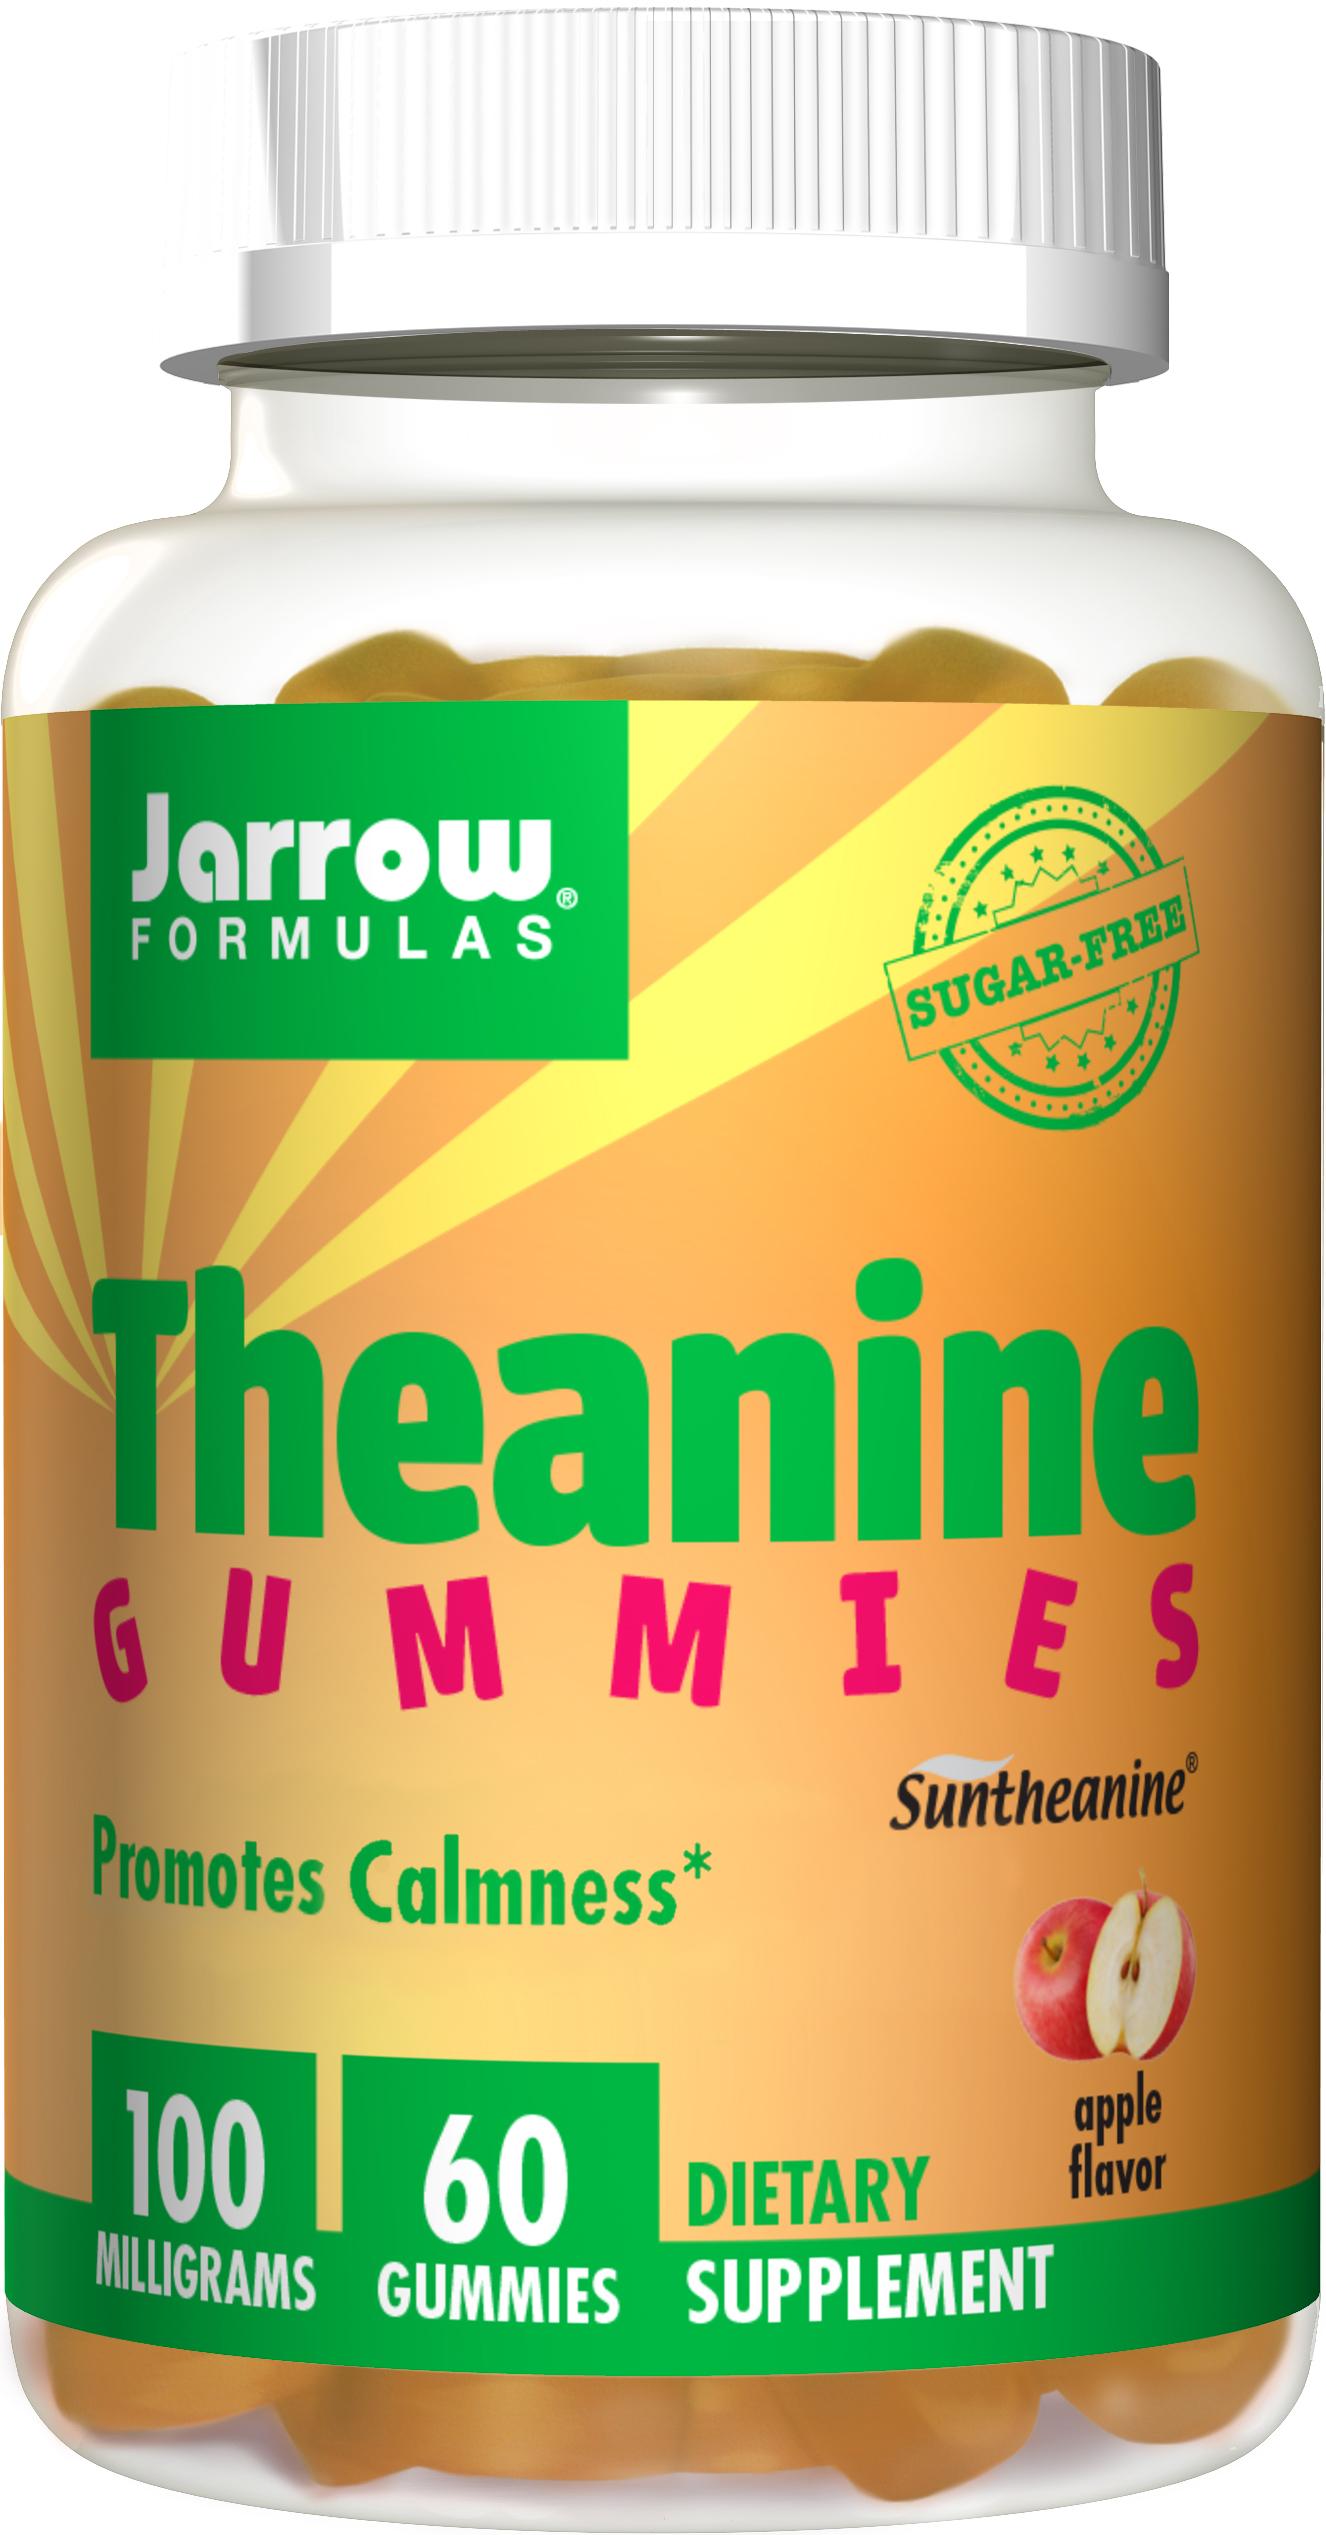 Theanine Gummies